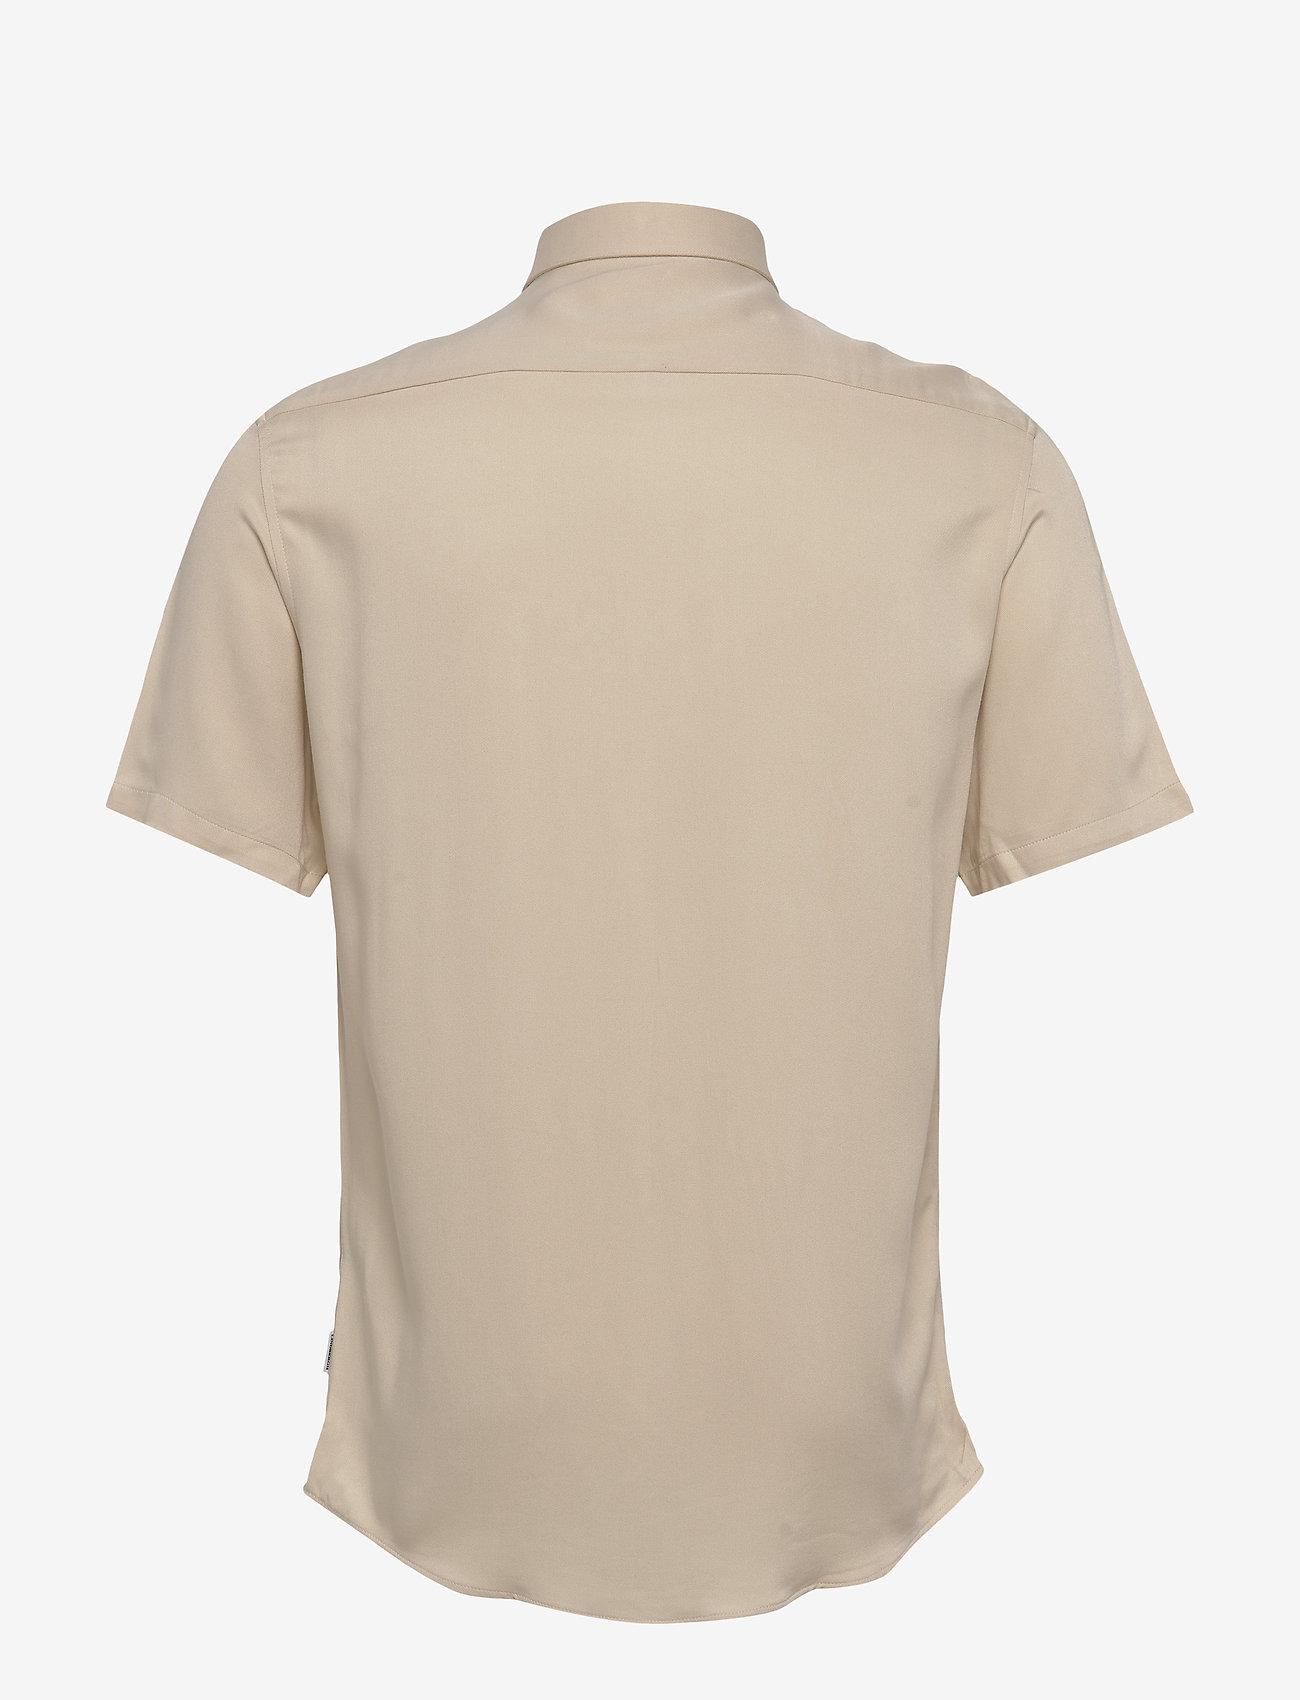 Lindbergh - Viscose shirt S/S - peruspaitoja - light sand - 1